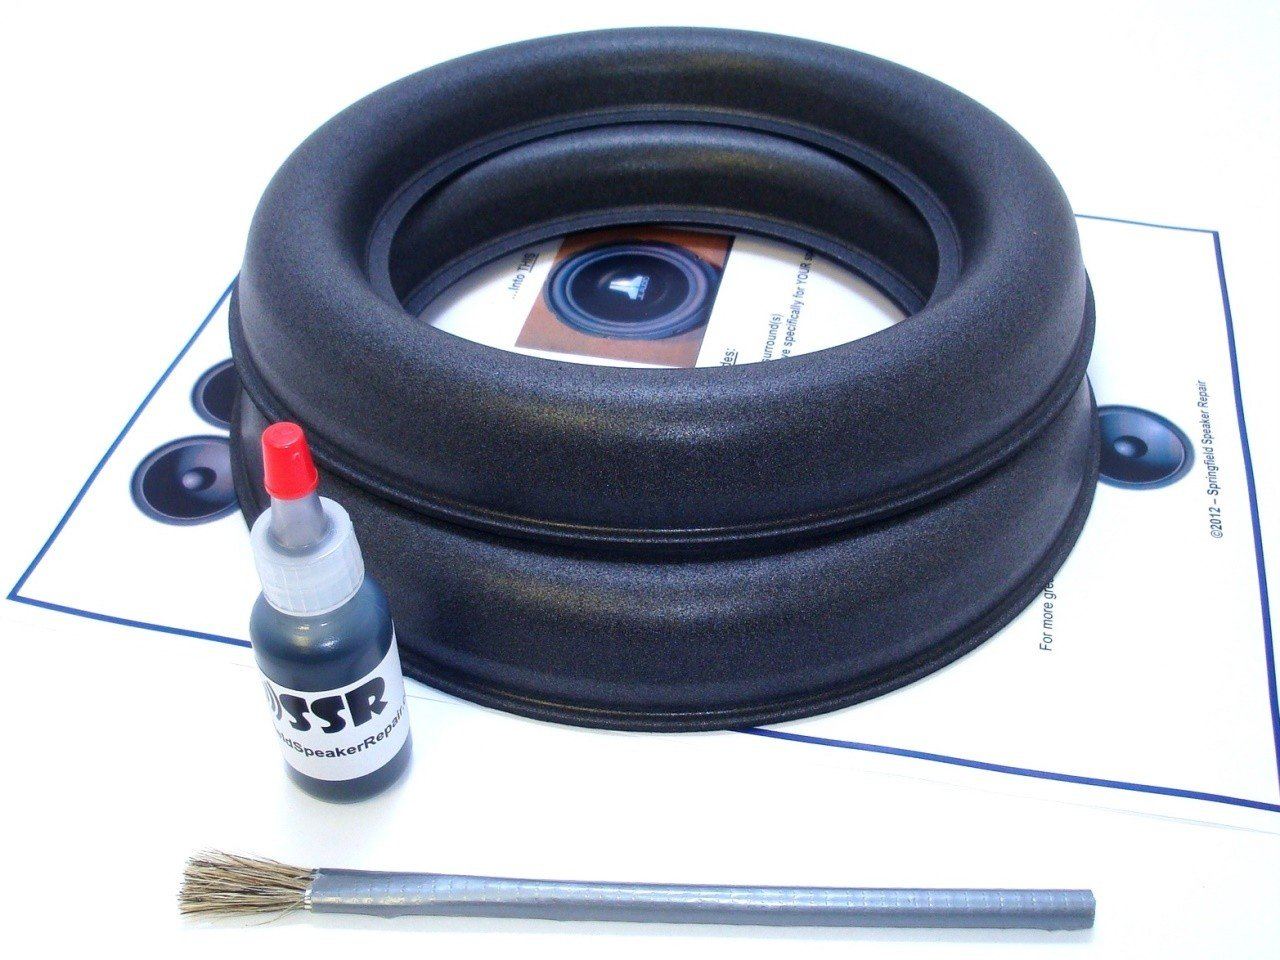 JL Audio 8W7 Speaker Foam Surround Repair Kit - 8 Inch